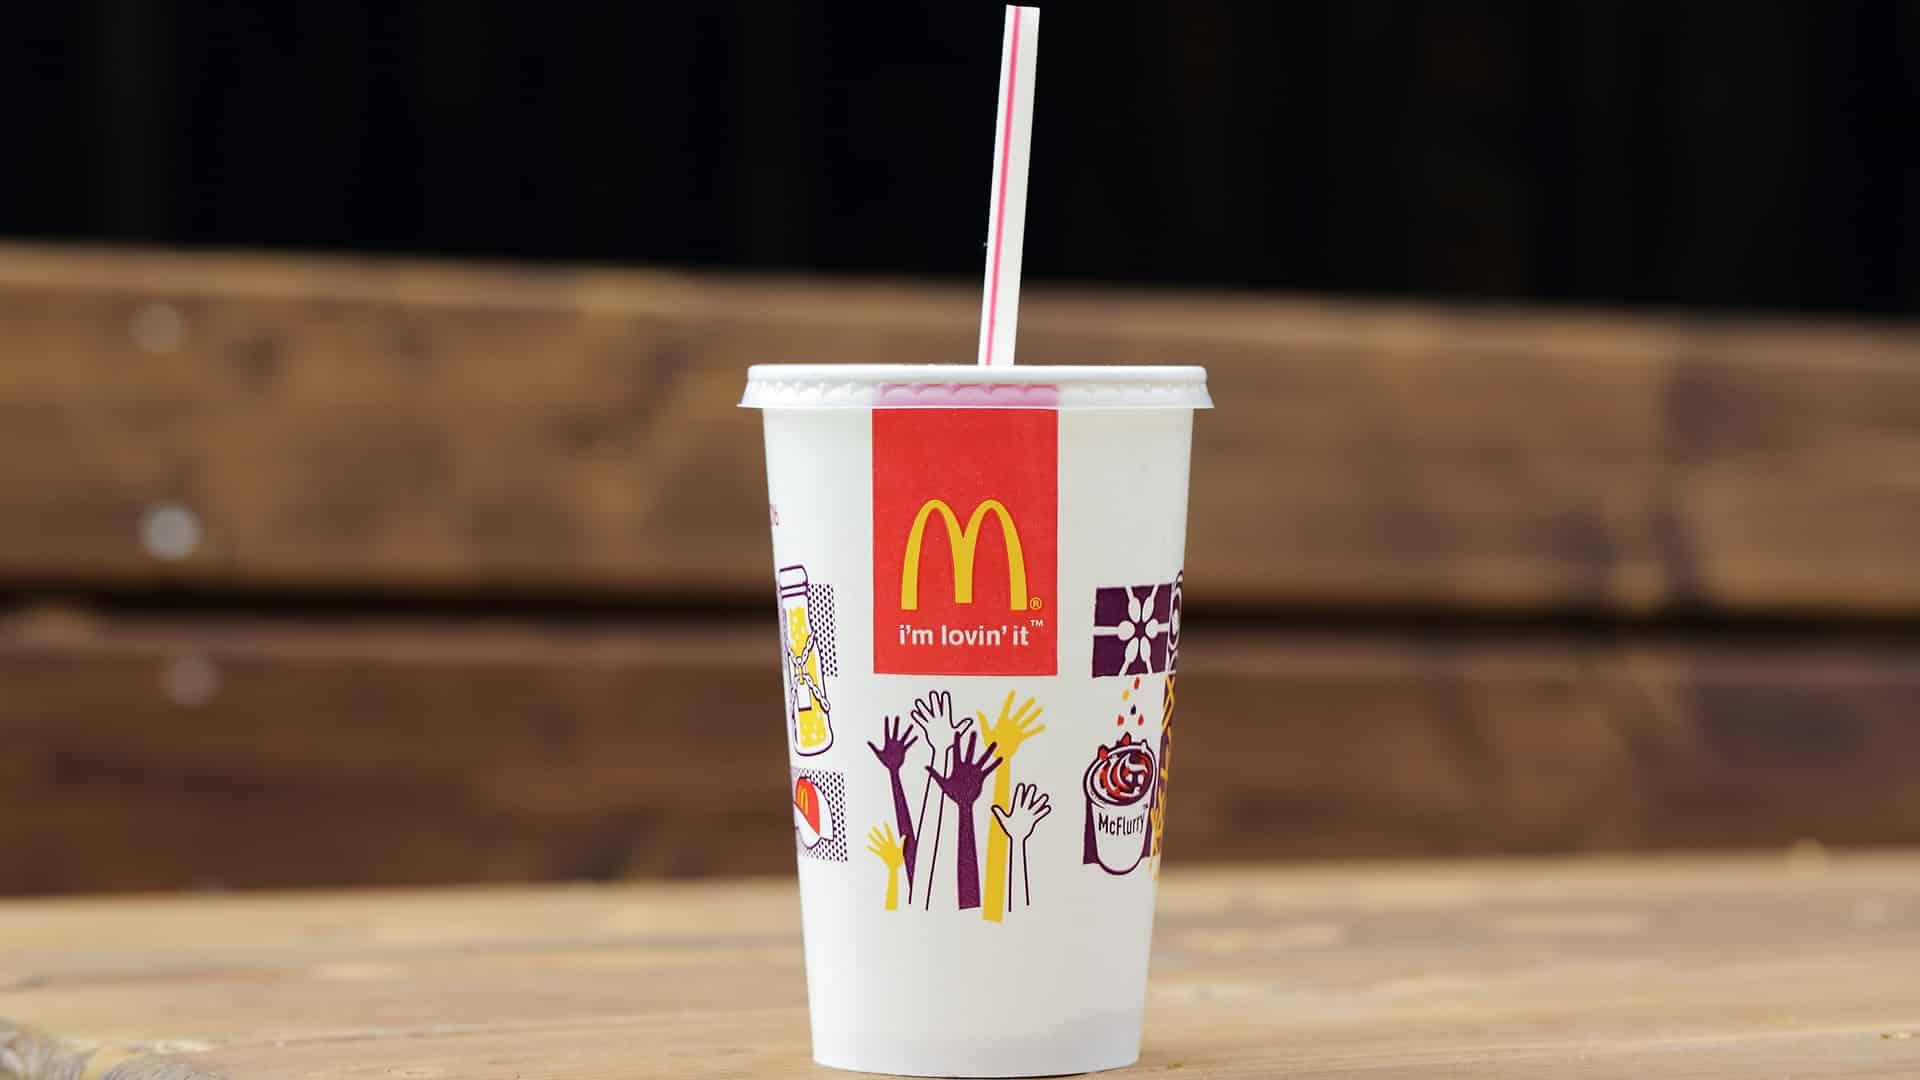 Harga-Minuman-di-McDonalds